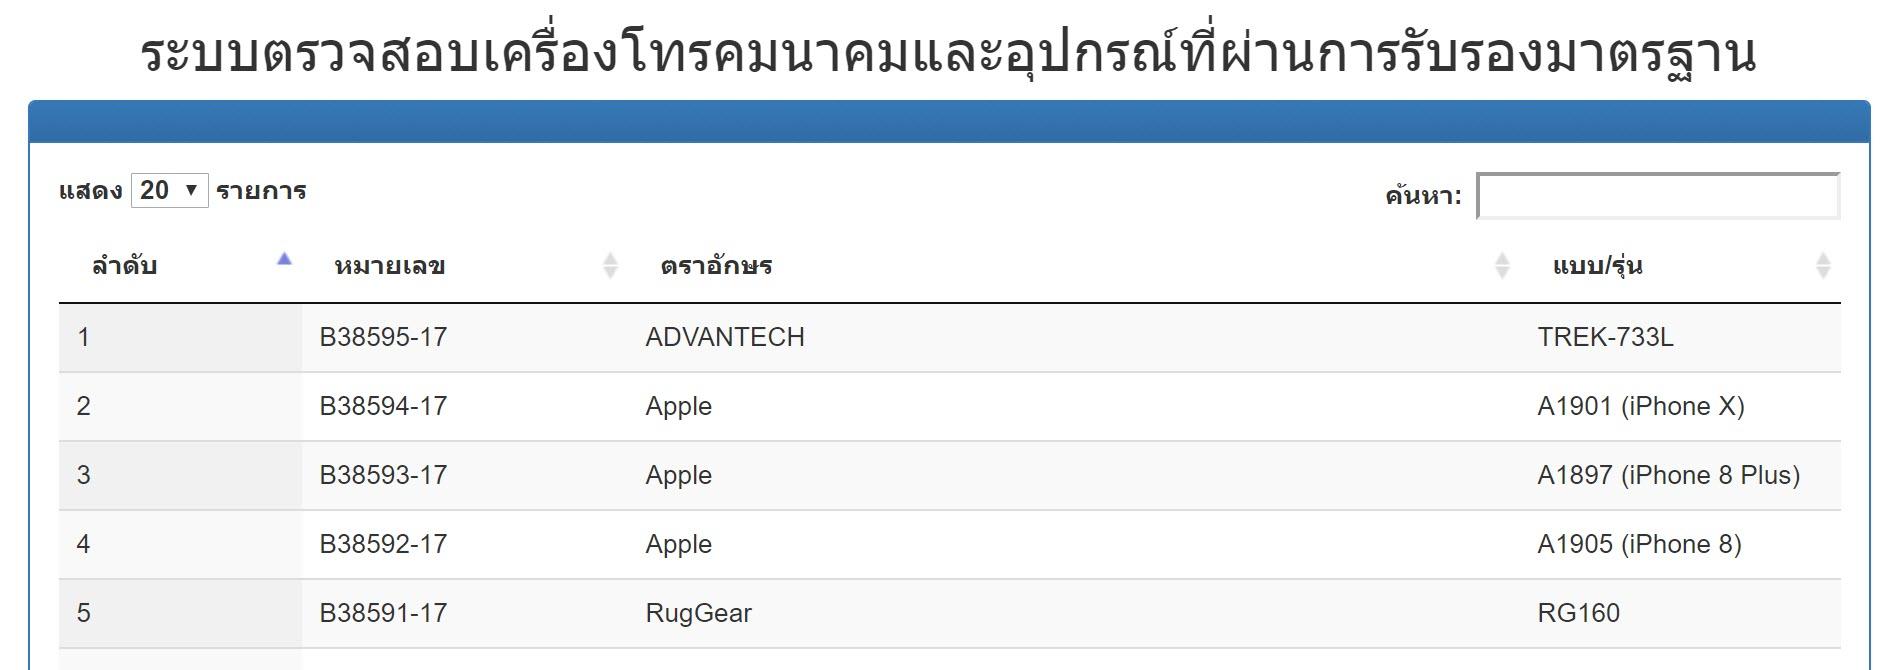 Nbtc Approve Iphone 8 Iphone X 1